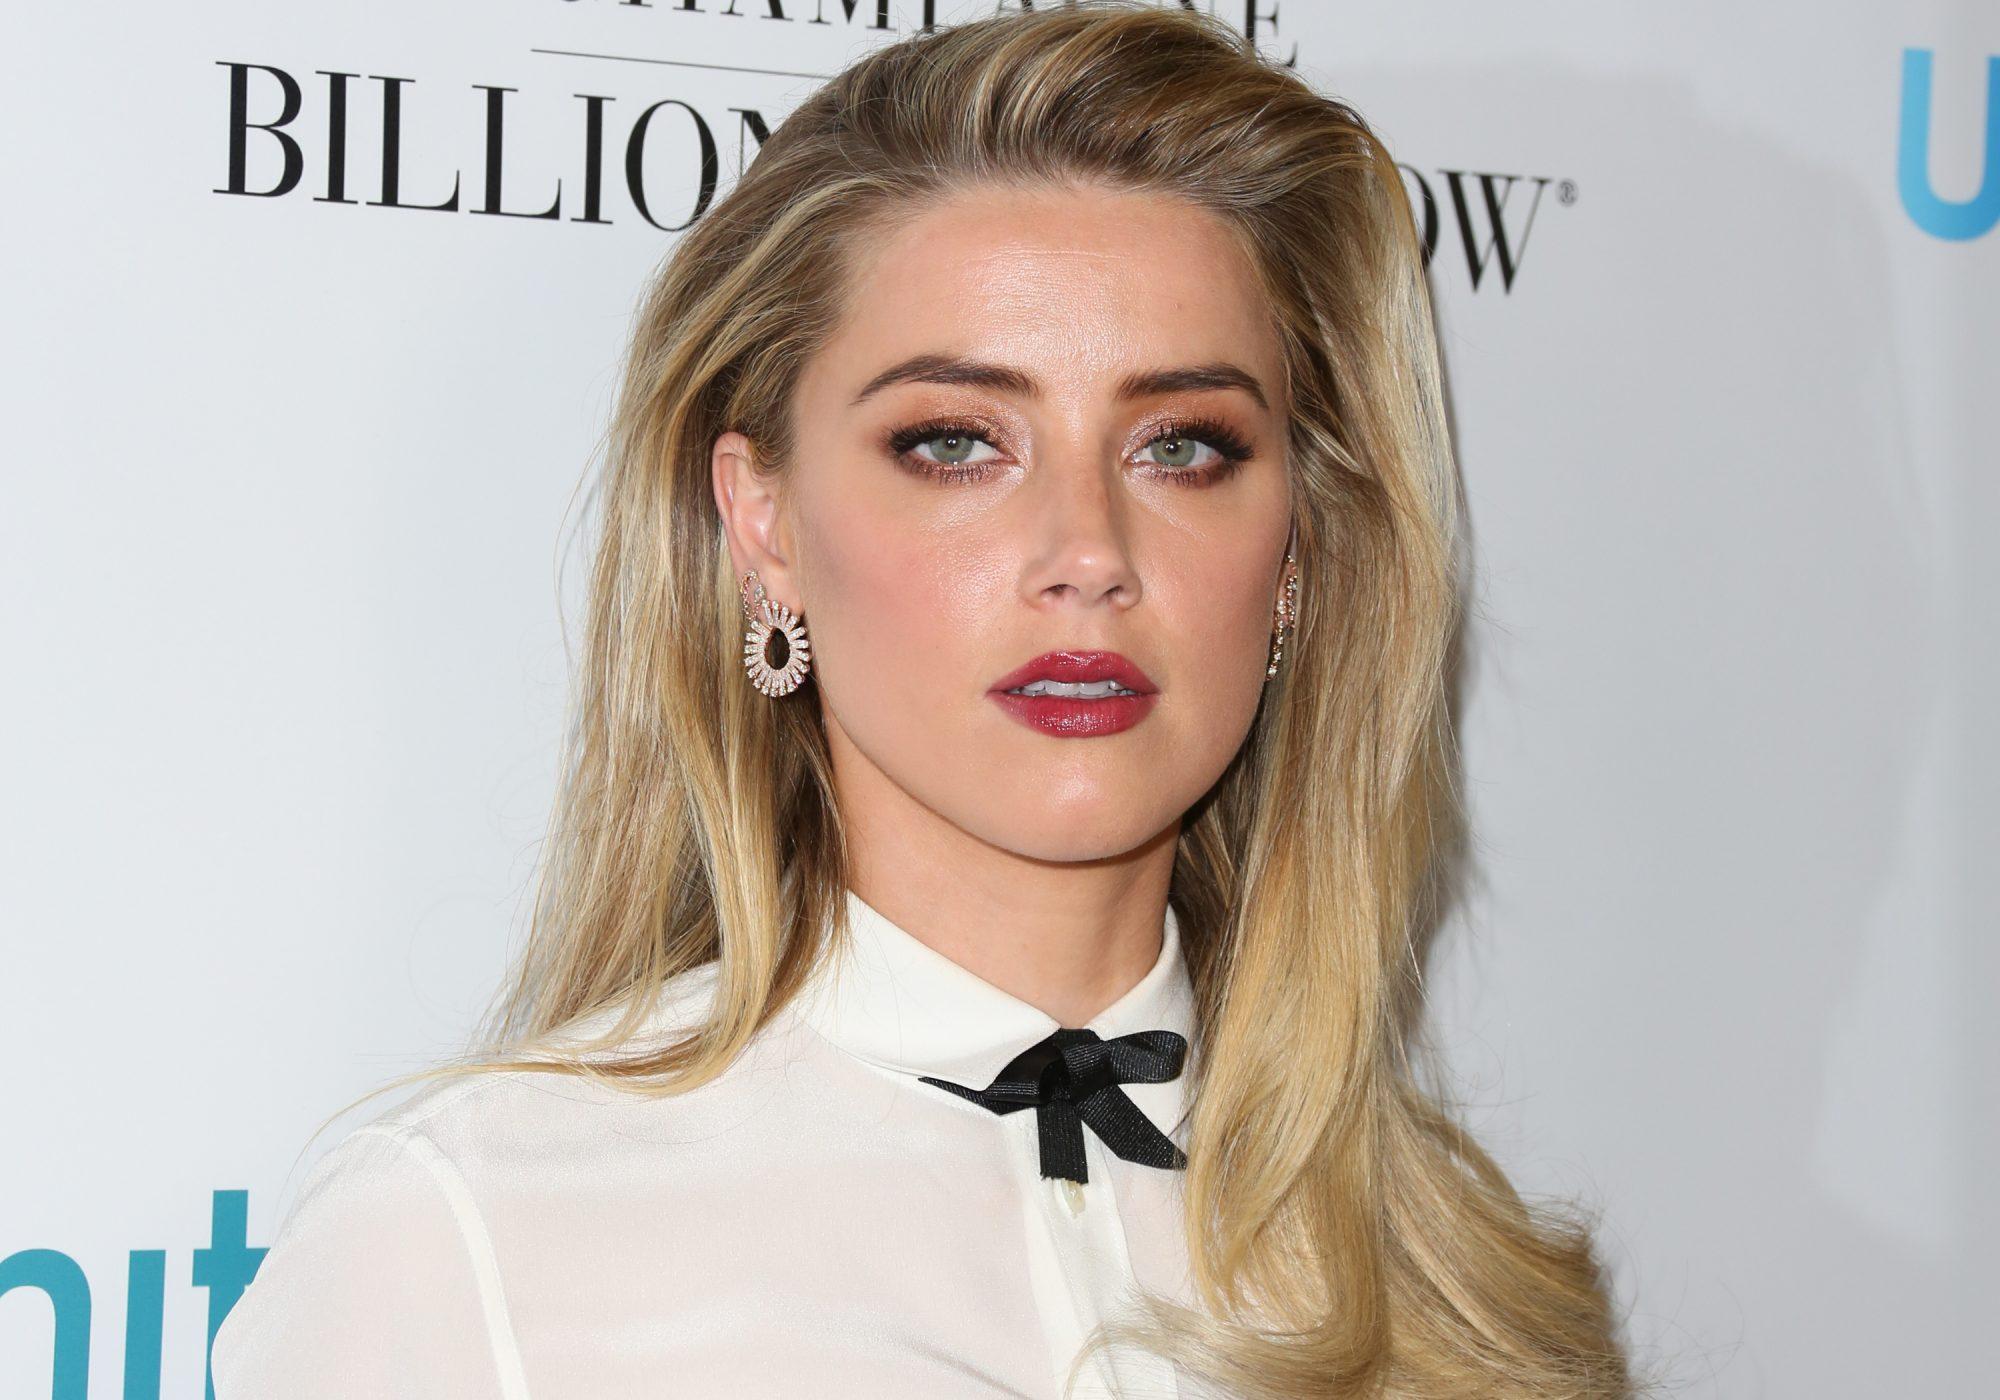 Image of Amber Heard